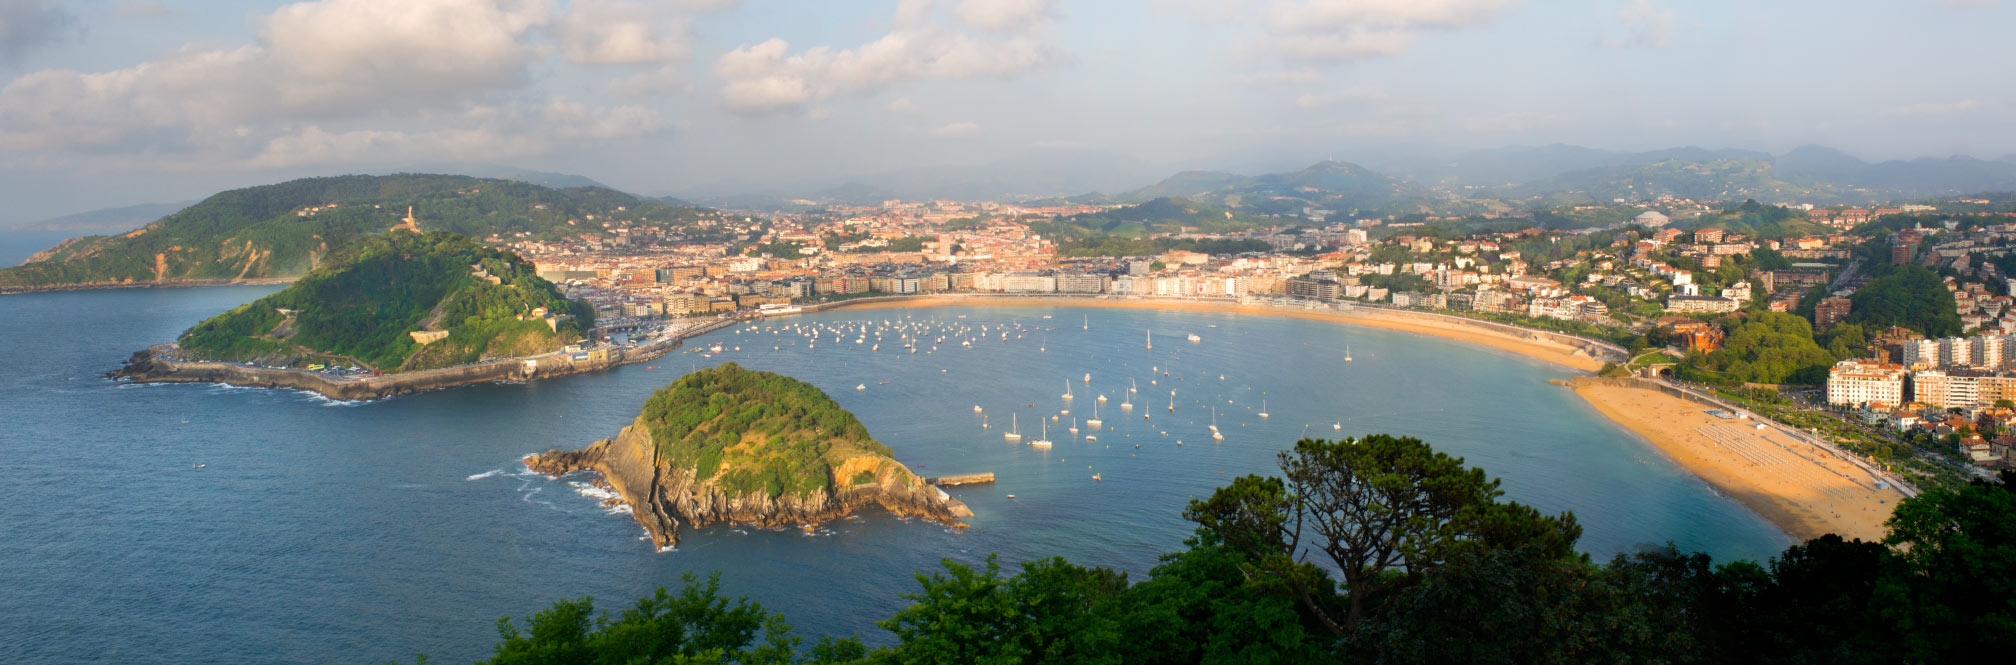 San sebastian spanien baskenland reisef hrer - Clima en donostia san sebastian ...